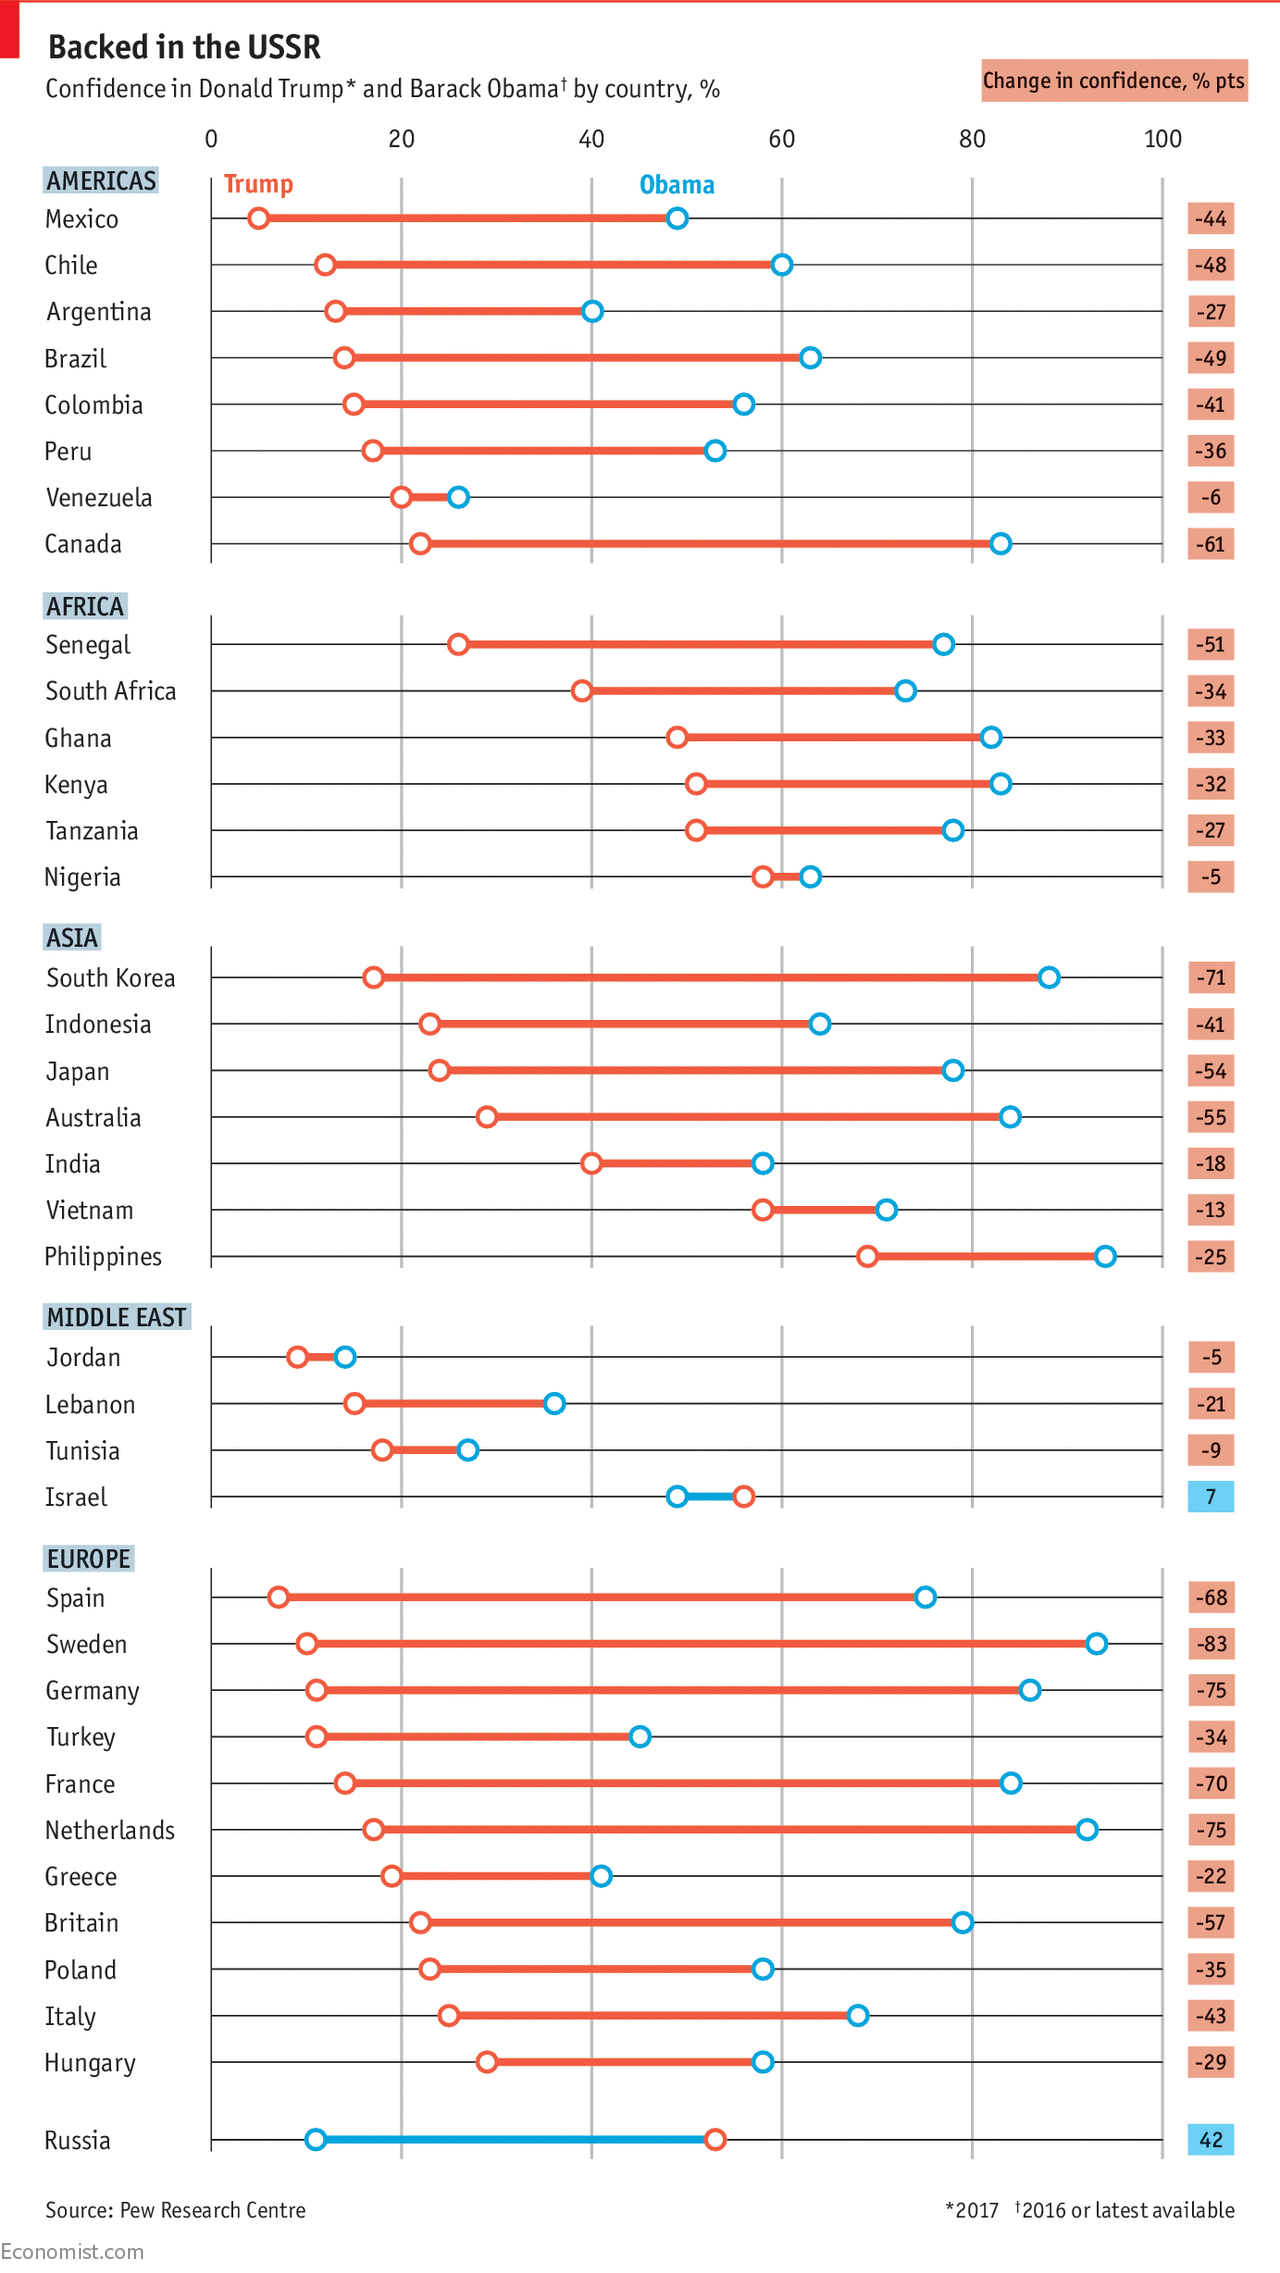 America's global standing plummets under Donald Trump